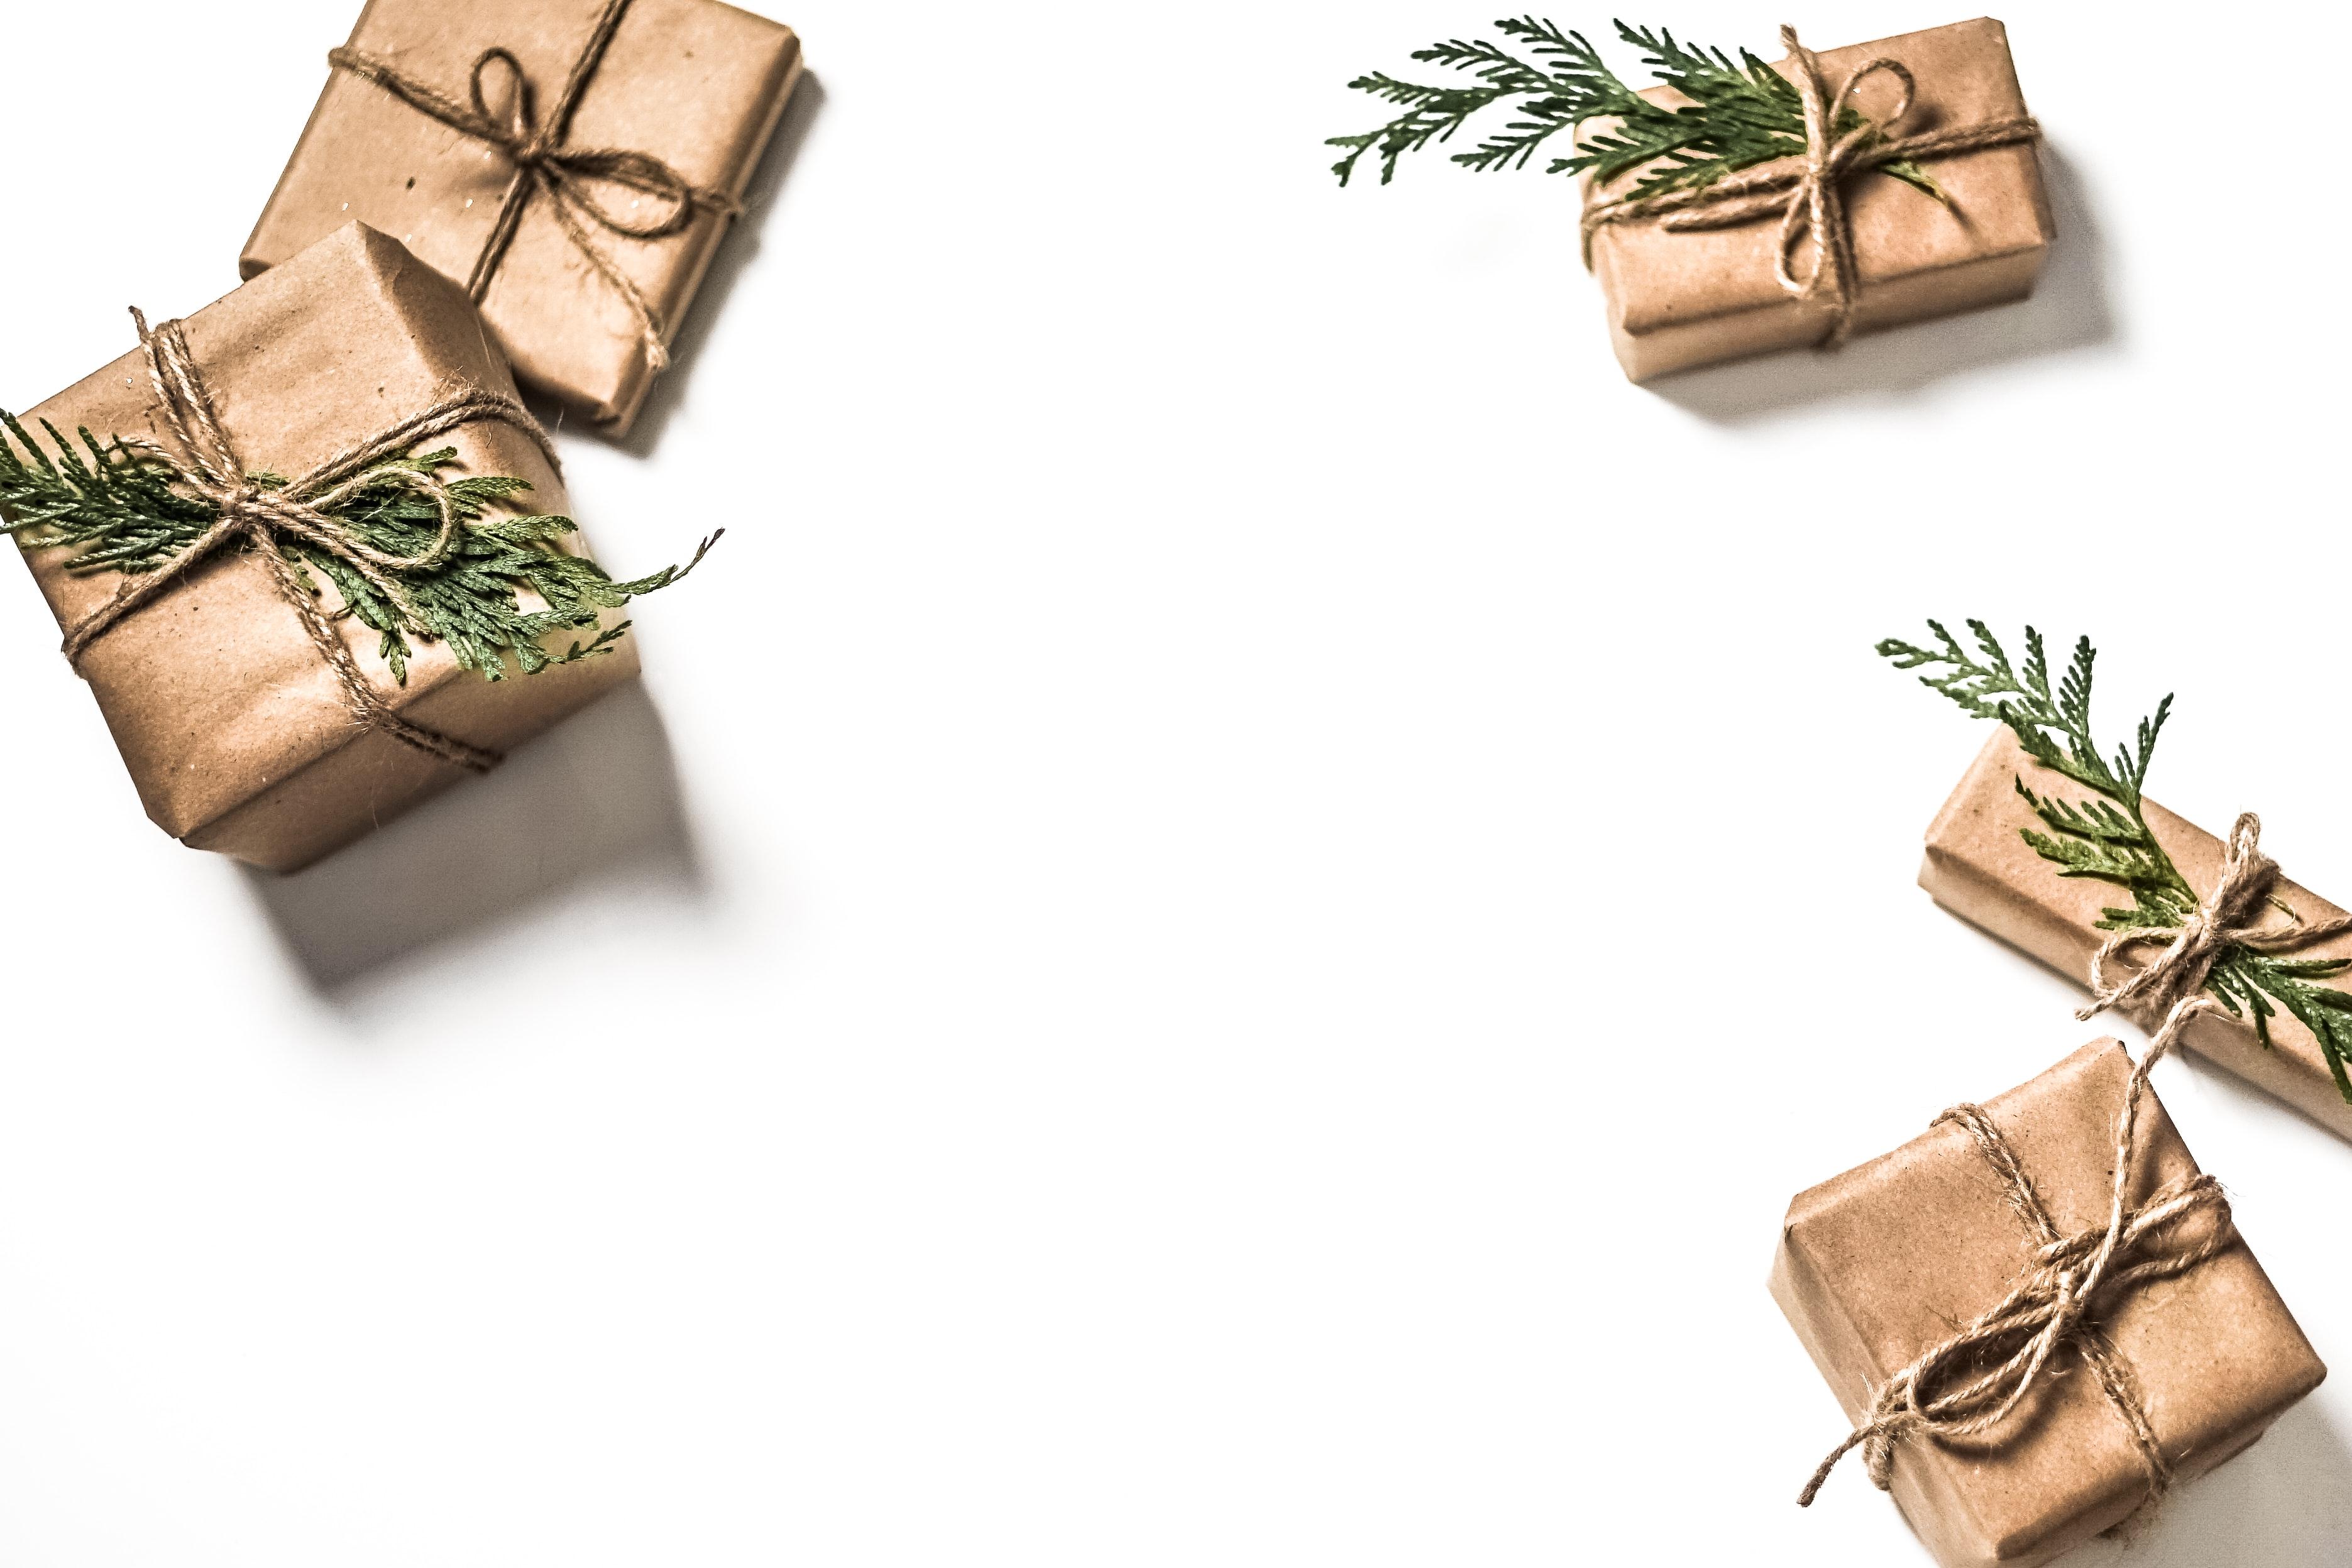 Course Image {mlang de}Weltweite Bescherung{mlang} {mlang en}Gifts Around the Globe{mlang} {mlang zh_cn}世界礼物文化大观{mlang}